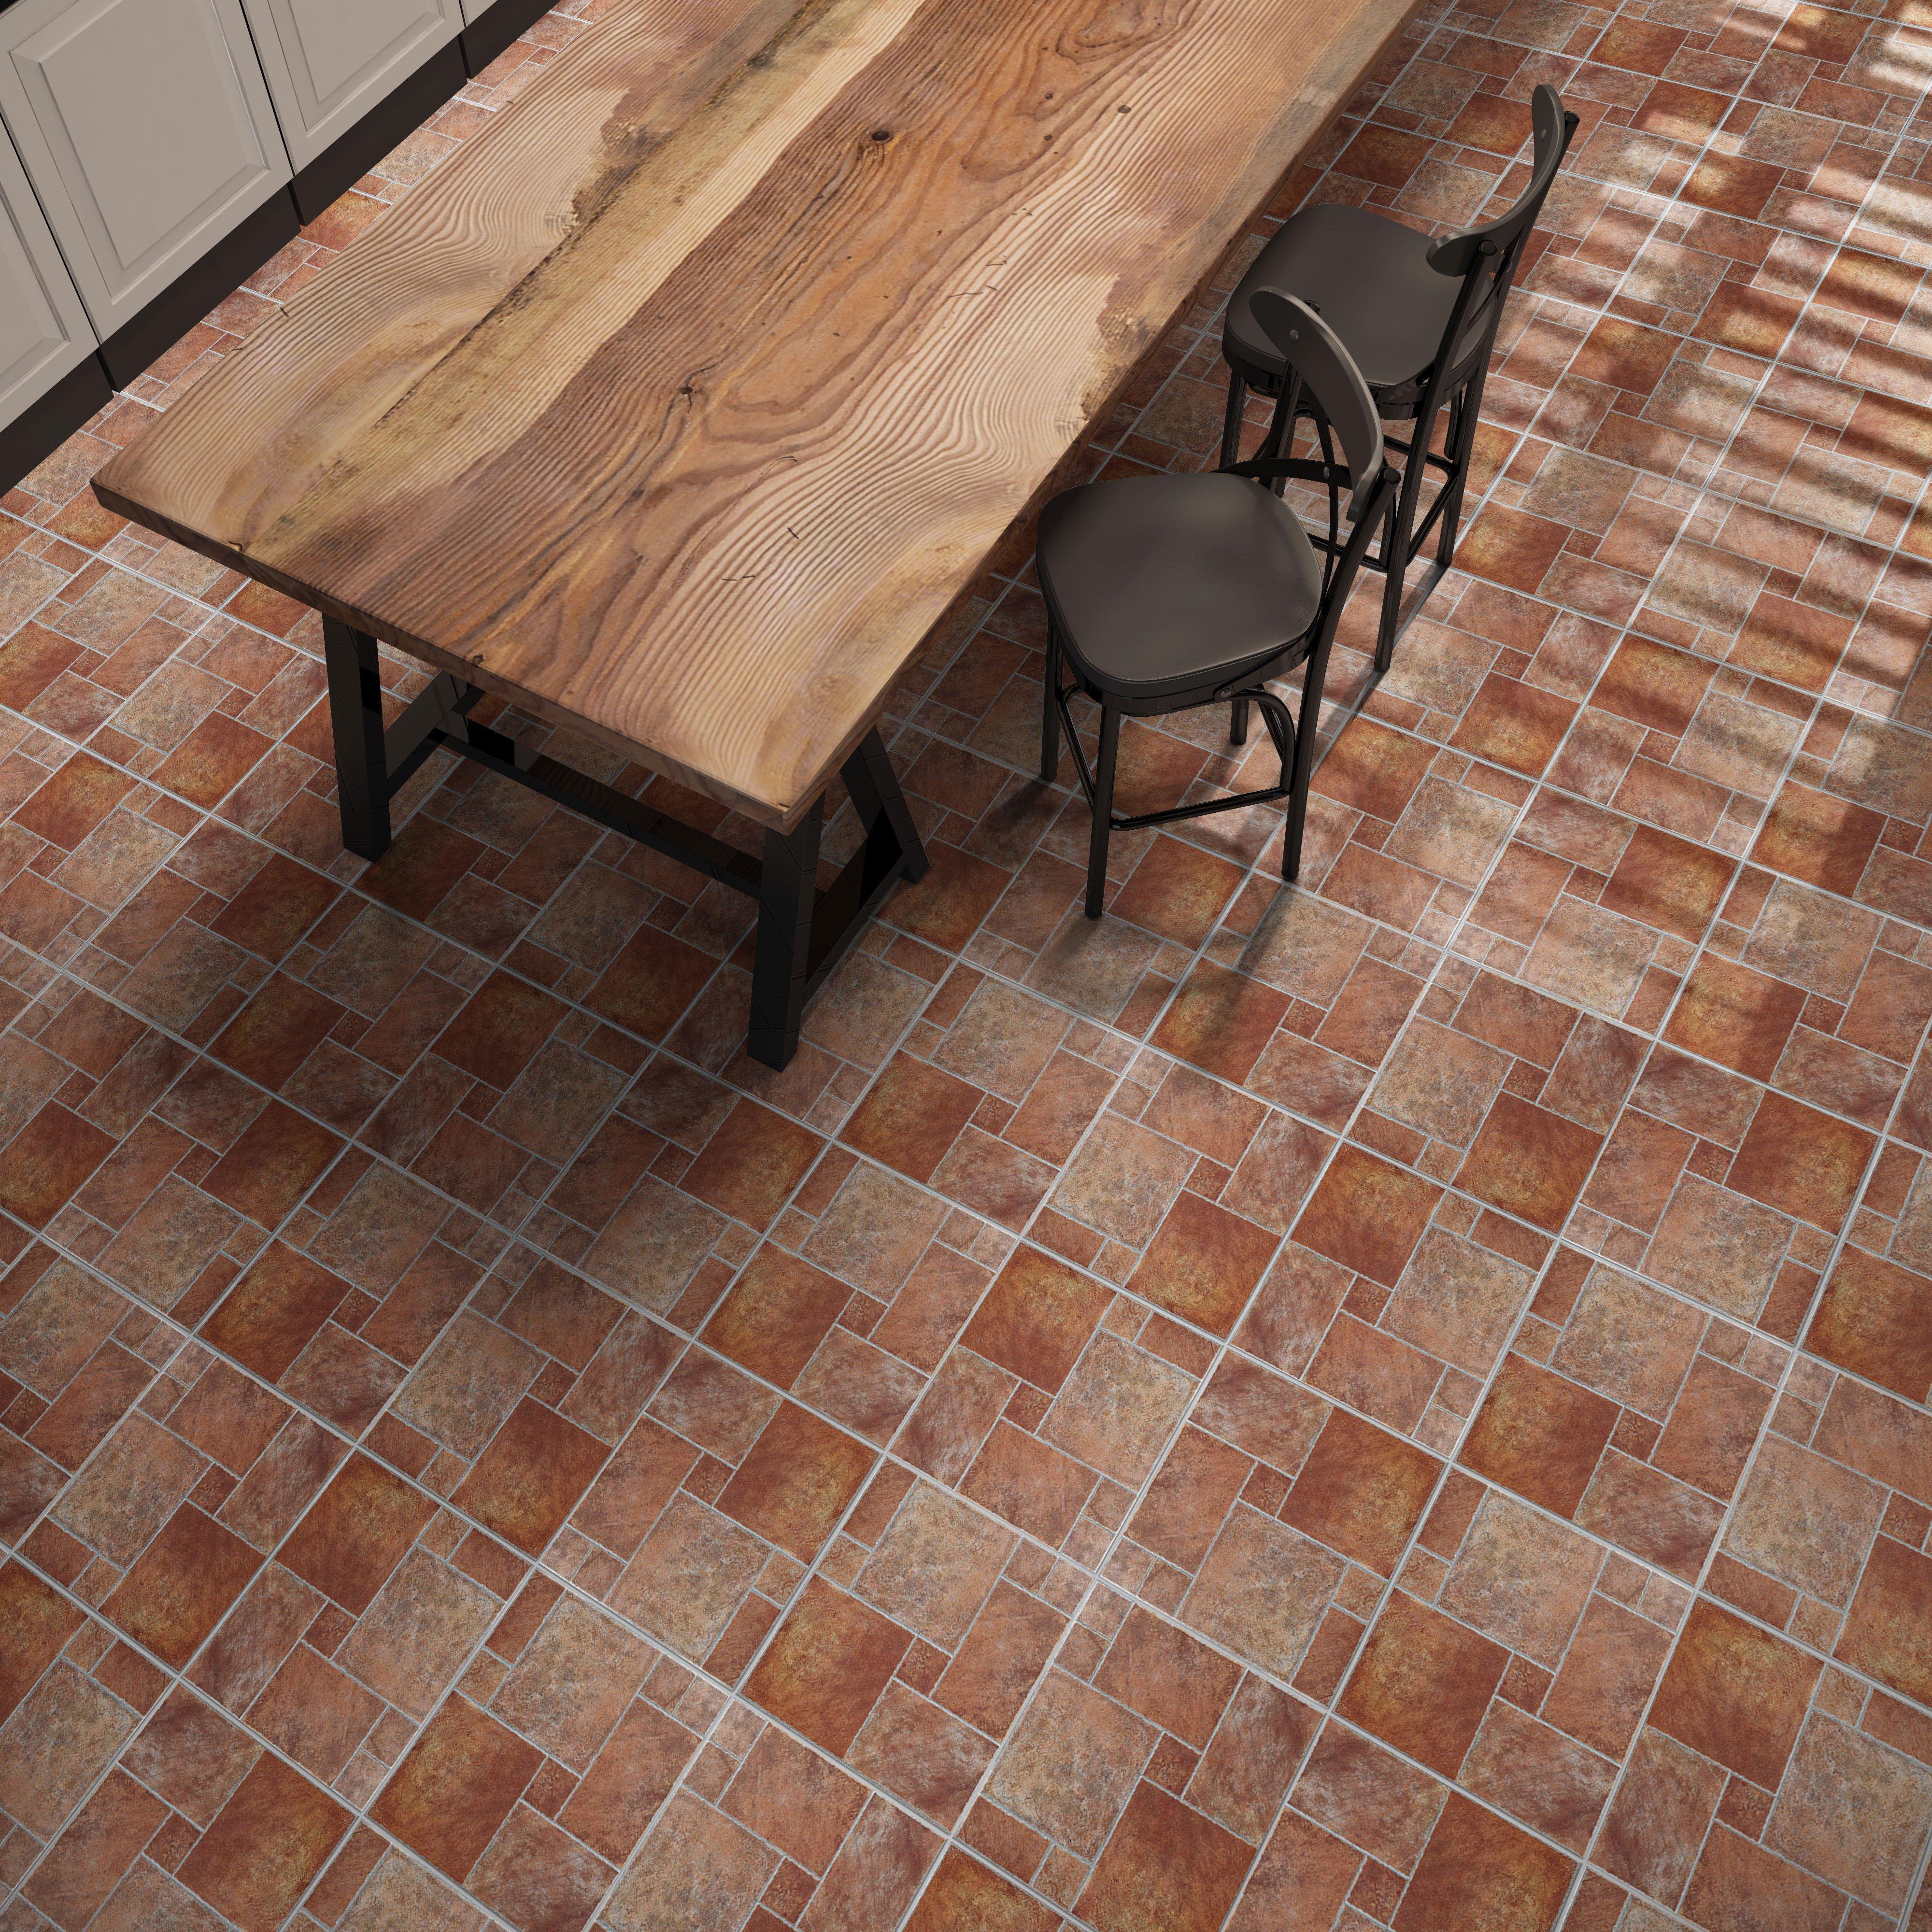 Terracotta floor tiles wooden furniture stock photos amp terracotta - Track Terracotta Ceramic Tile Click To Zoom